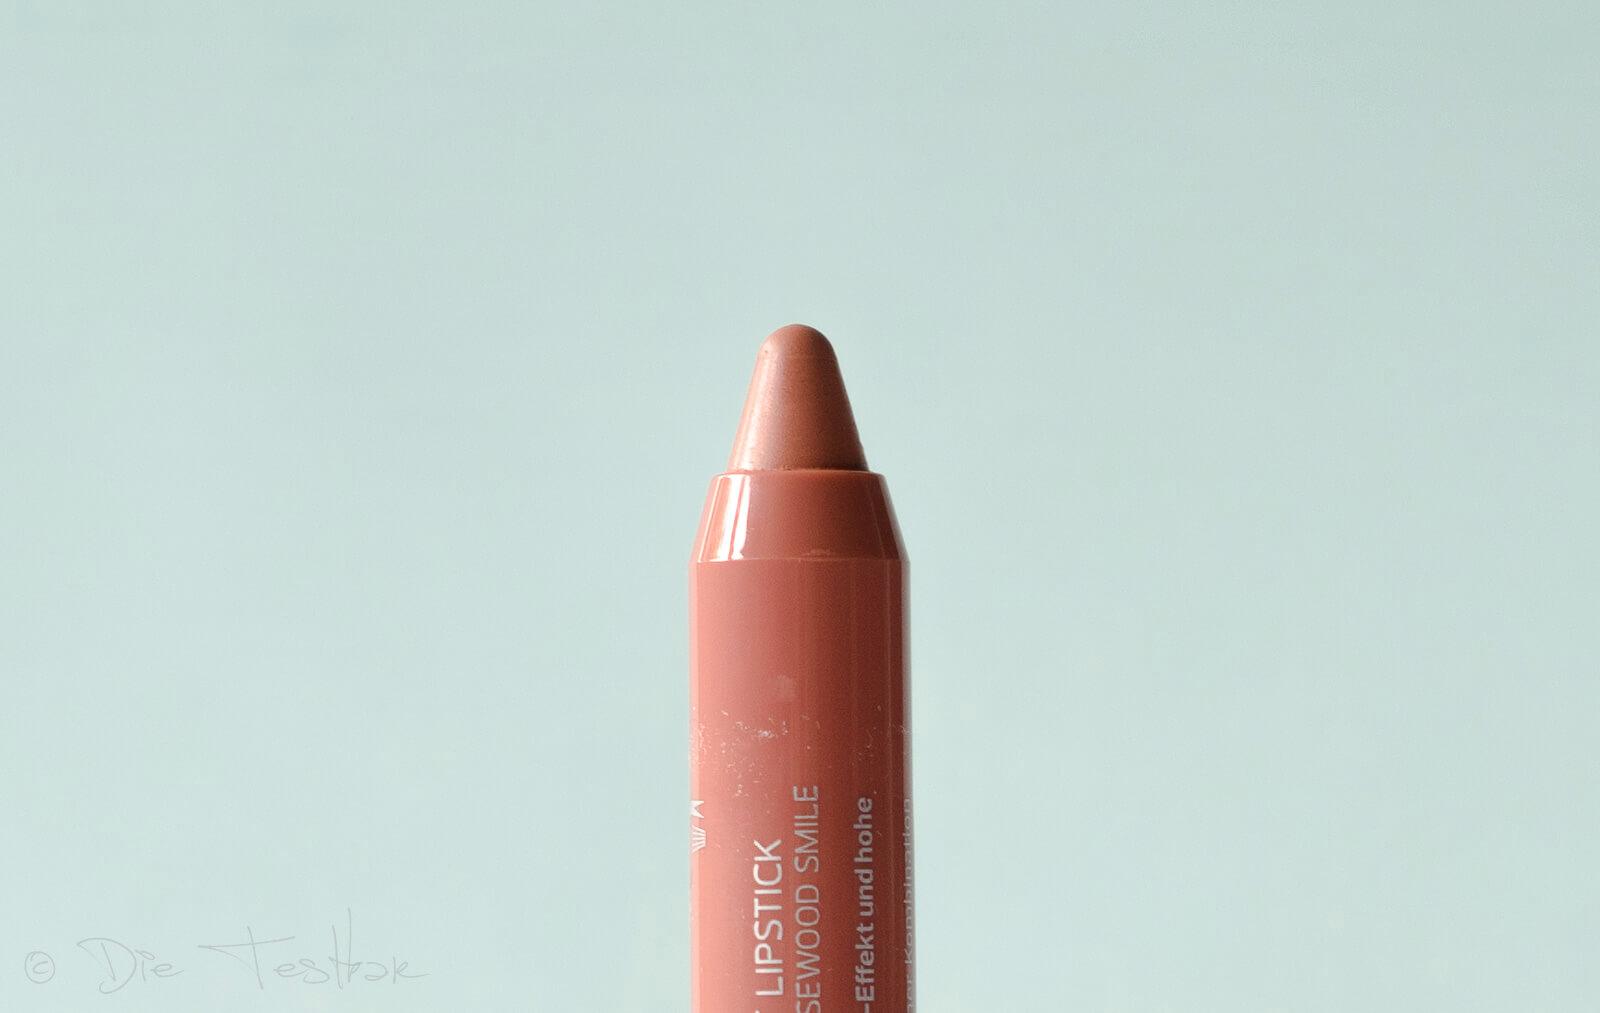 alverde Naturkosmetik - Lippenstift Matt Lipstick Rosewood Smile